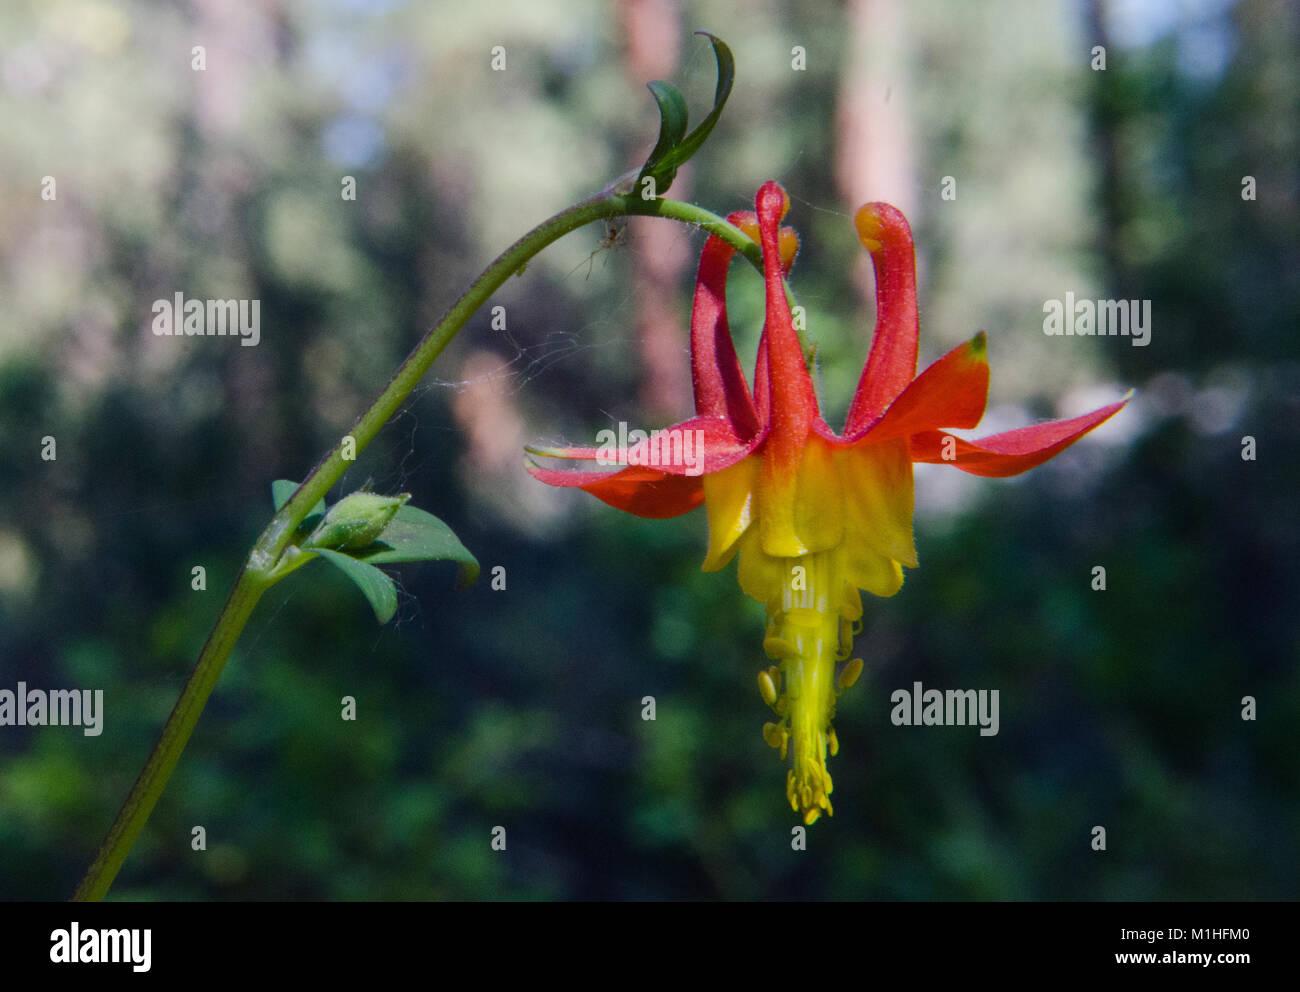 Bloom Of The Western Columbine Stock Photo 173103840 Alamy